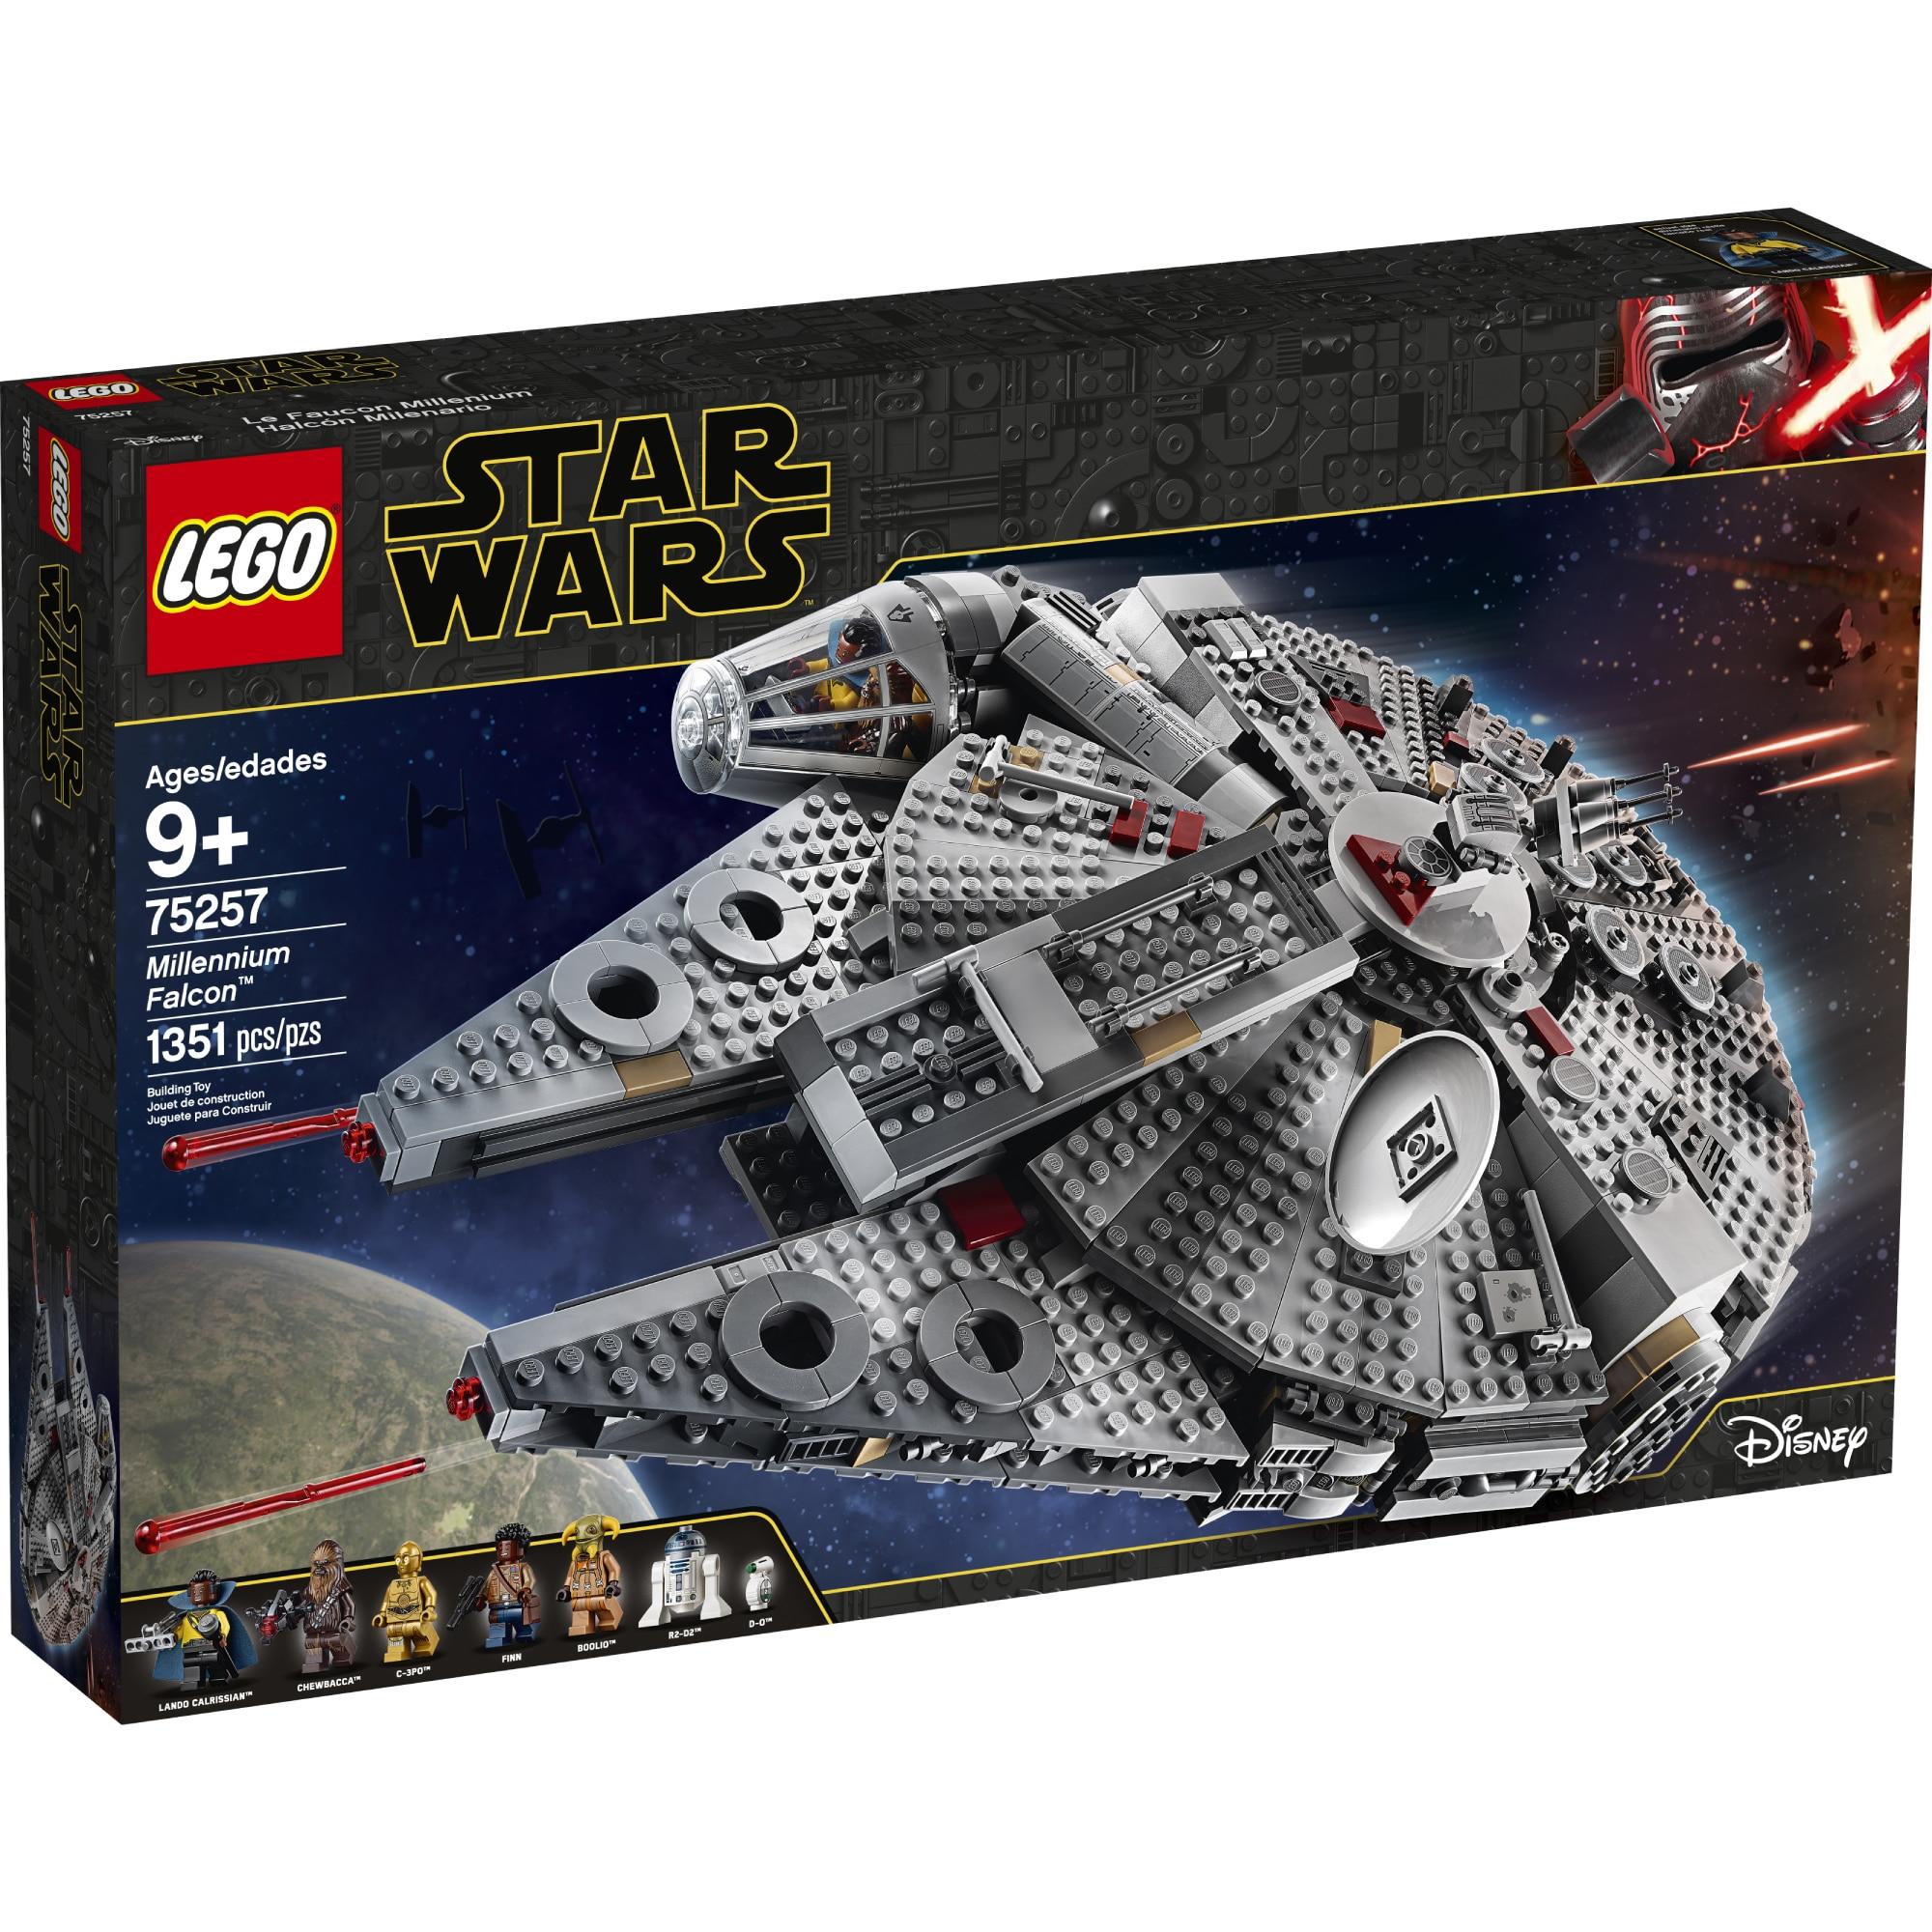 Fotografie LEGO Star Wars - Millennium Falcon 75257, 1353 piese